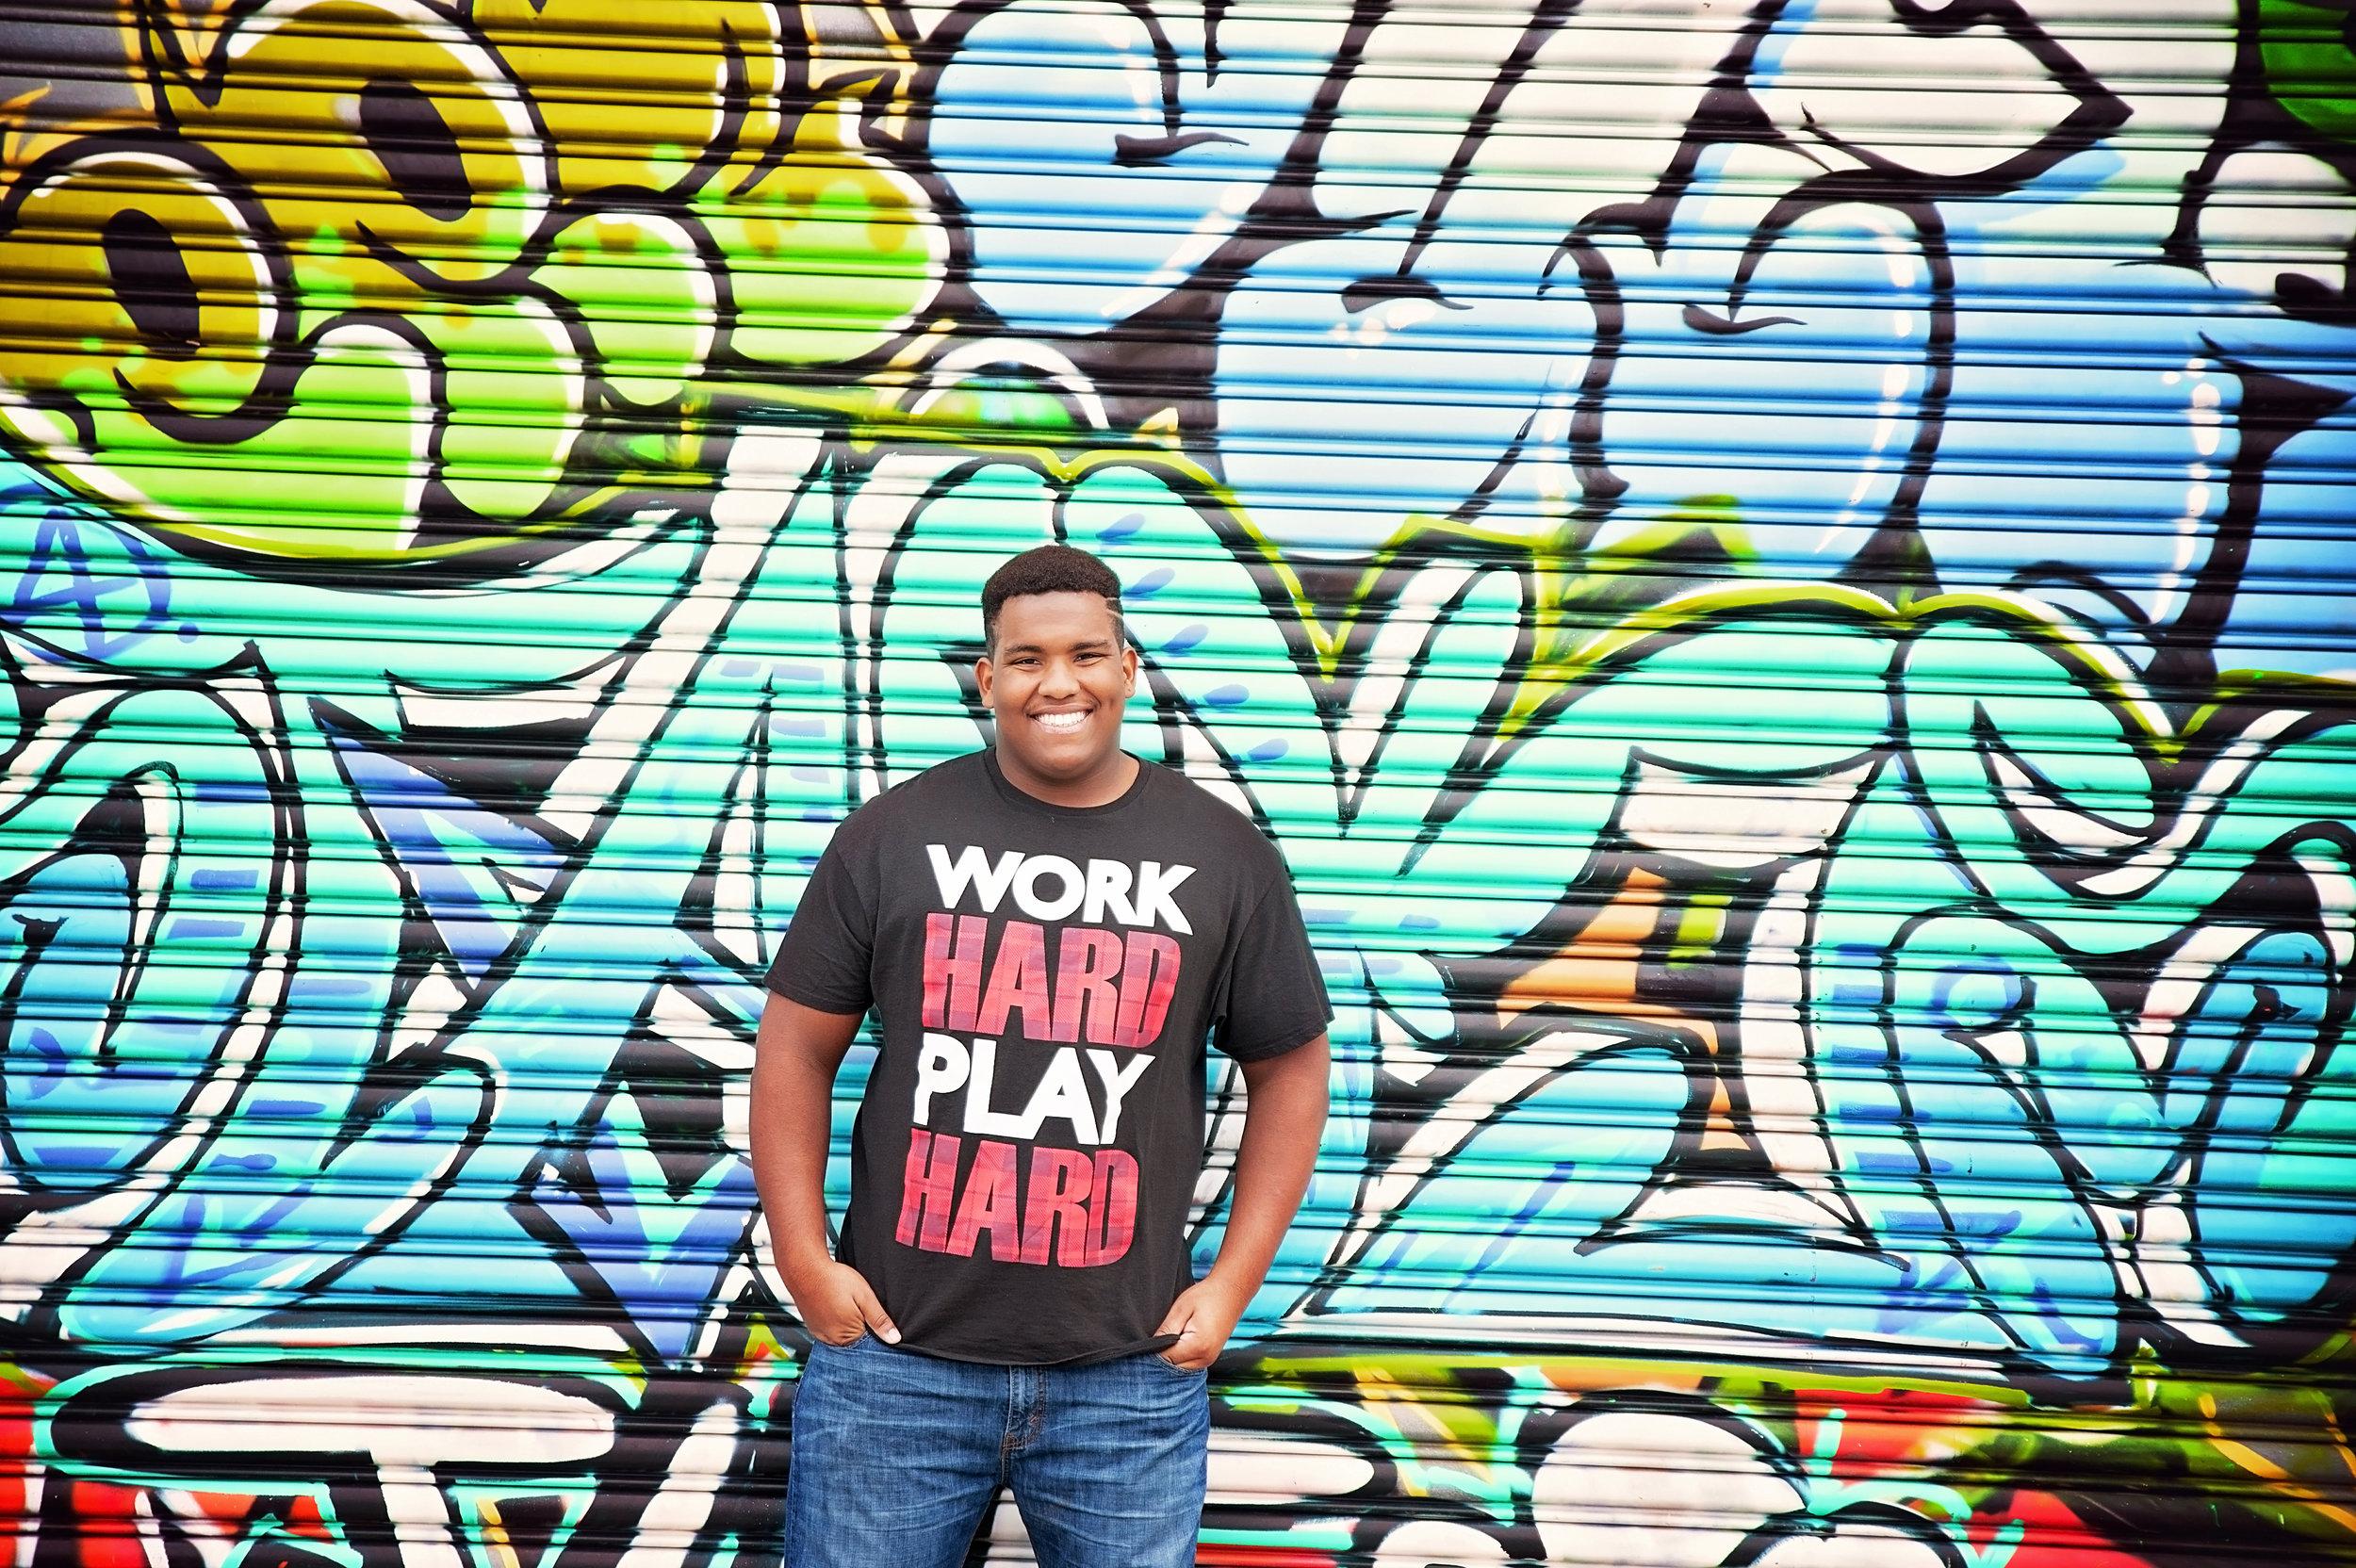 South Florida-photography-professional photographer-photography website-local photographer-teens-high school senior-photos-portrait photographer-61.jpg